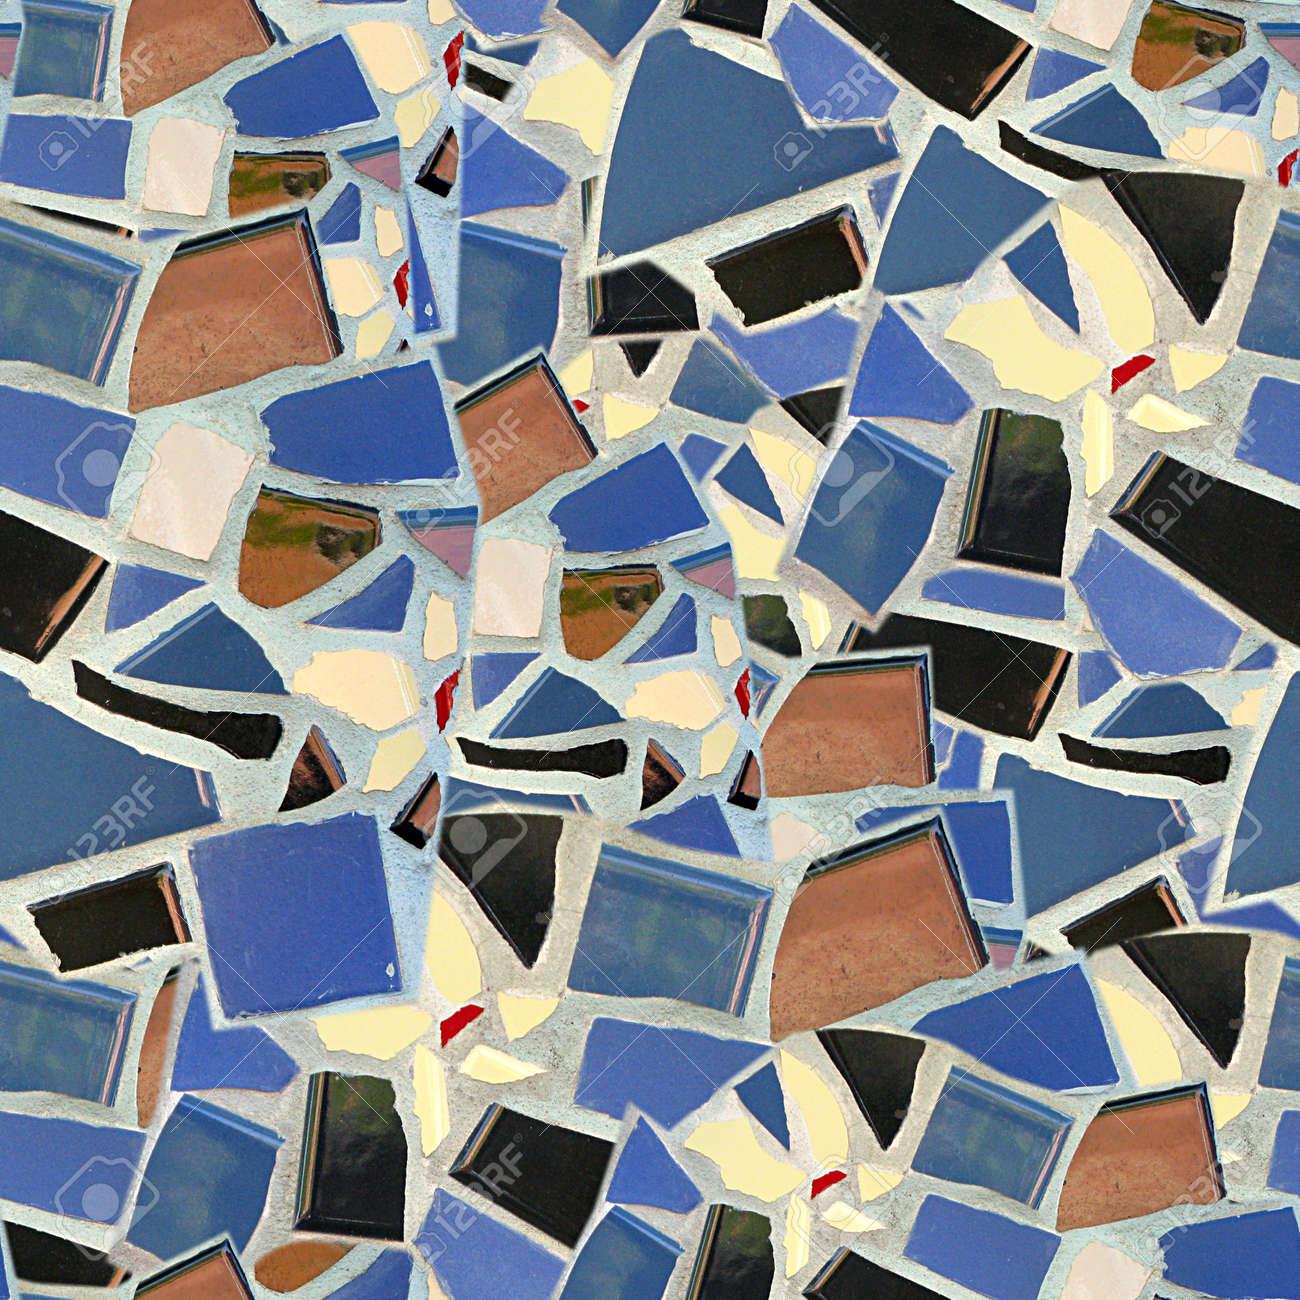 Broken tile mosaic seamless texture tile stock photo picture and broken tile mosaic seamless texture tile stock photo 14215910 dailygadgetfo Image collections